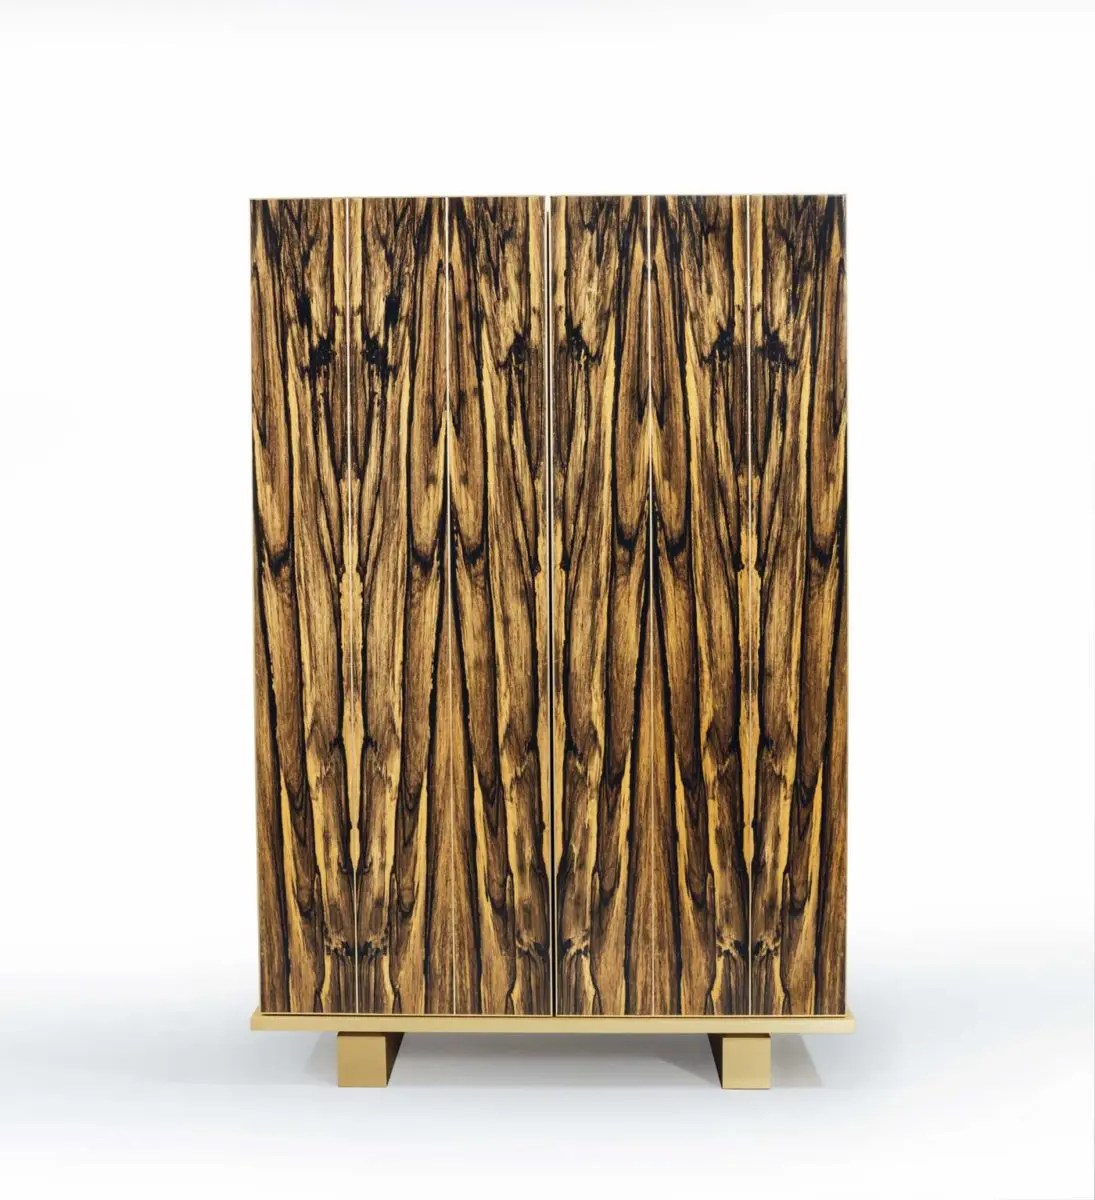 Cabinet-Plumage